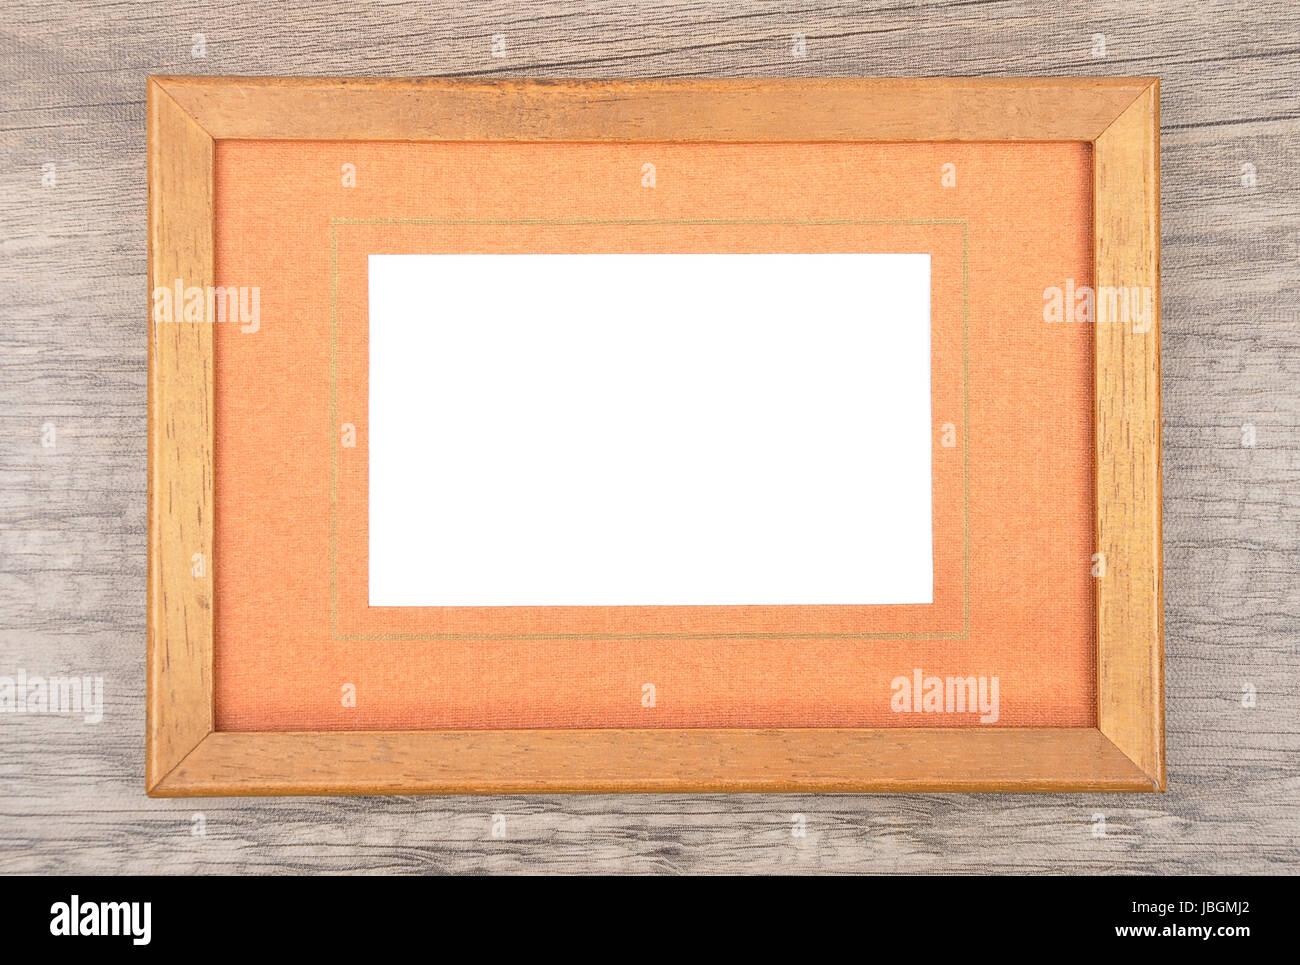 Fotorahmen Stockfotos & Fotorahmen Bilder - Alamy